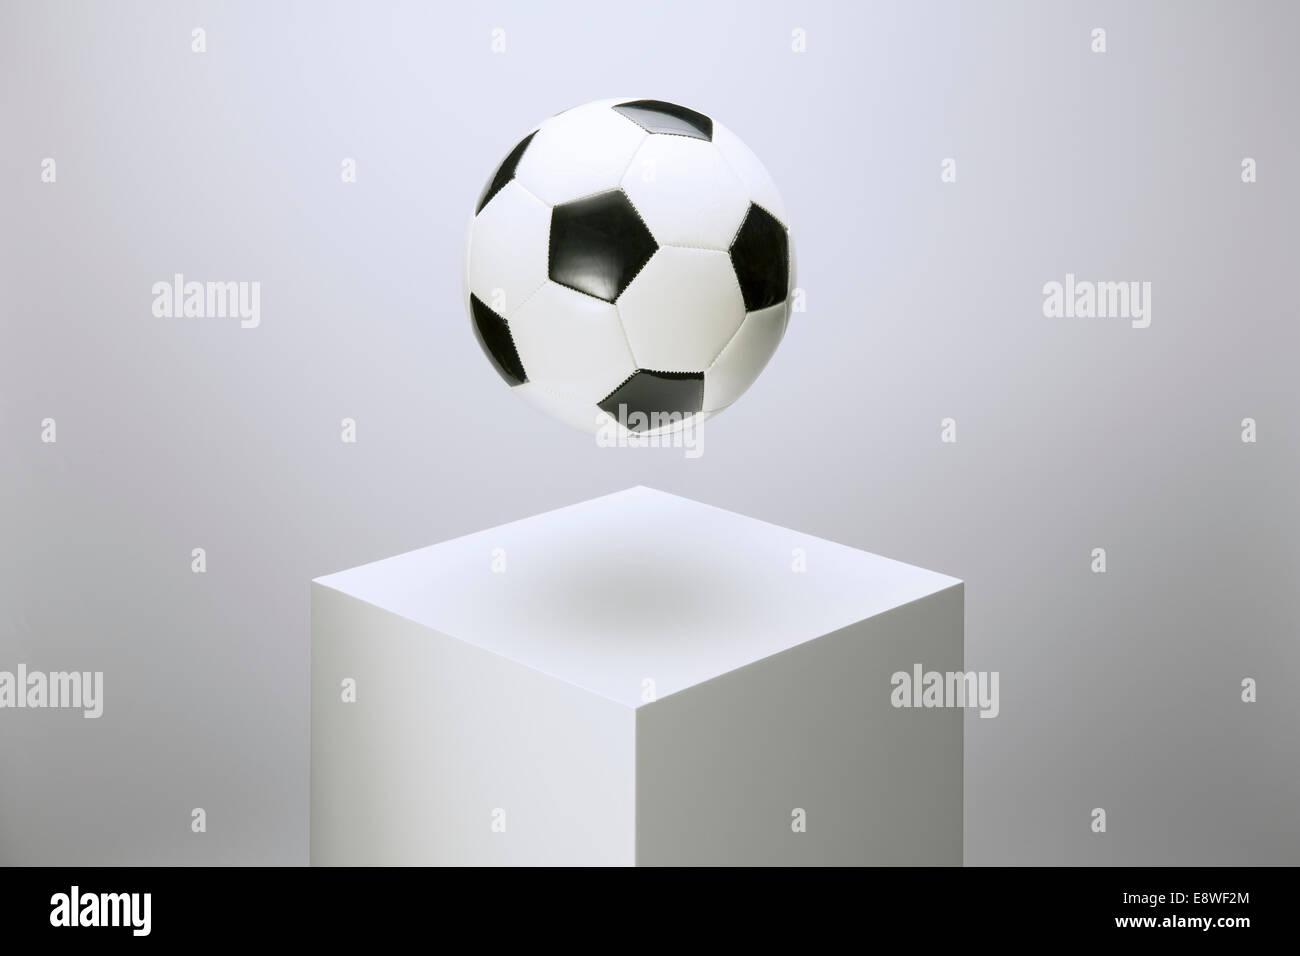 Soccer ball hovering over pedestal - Stock Image